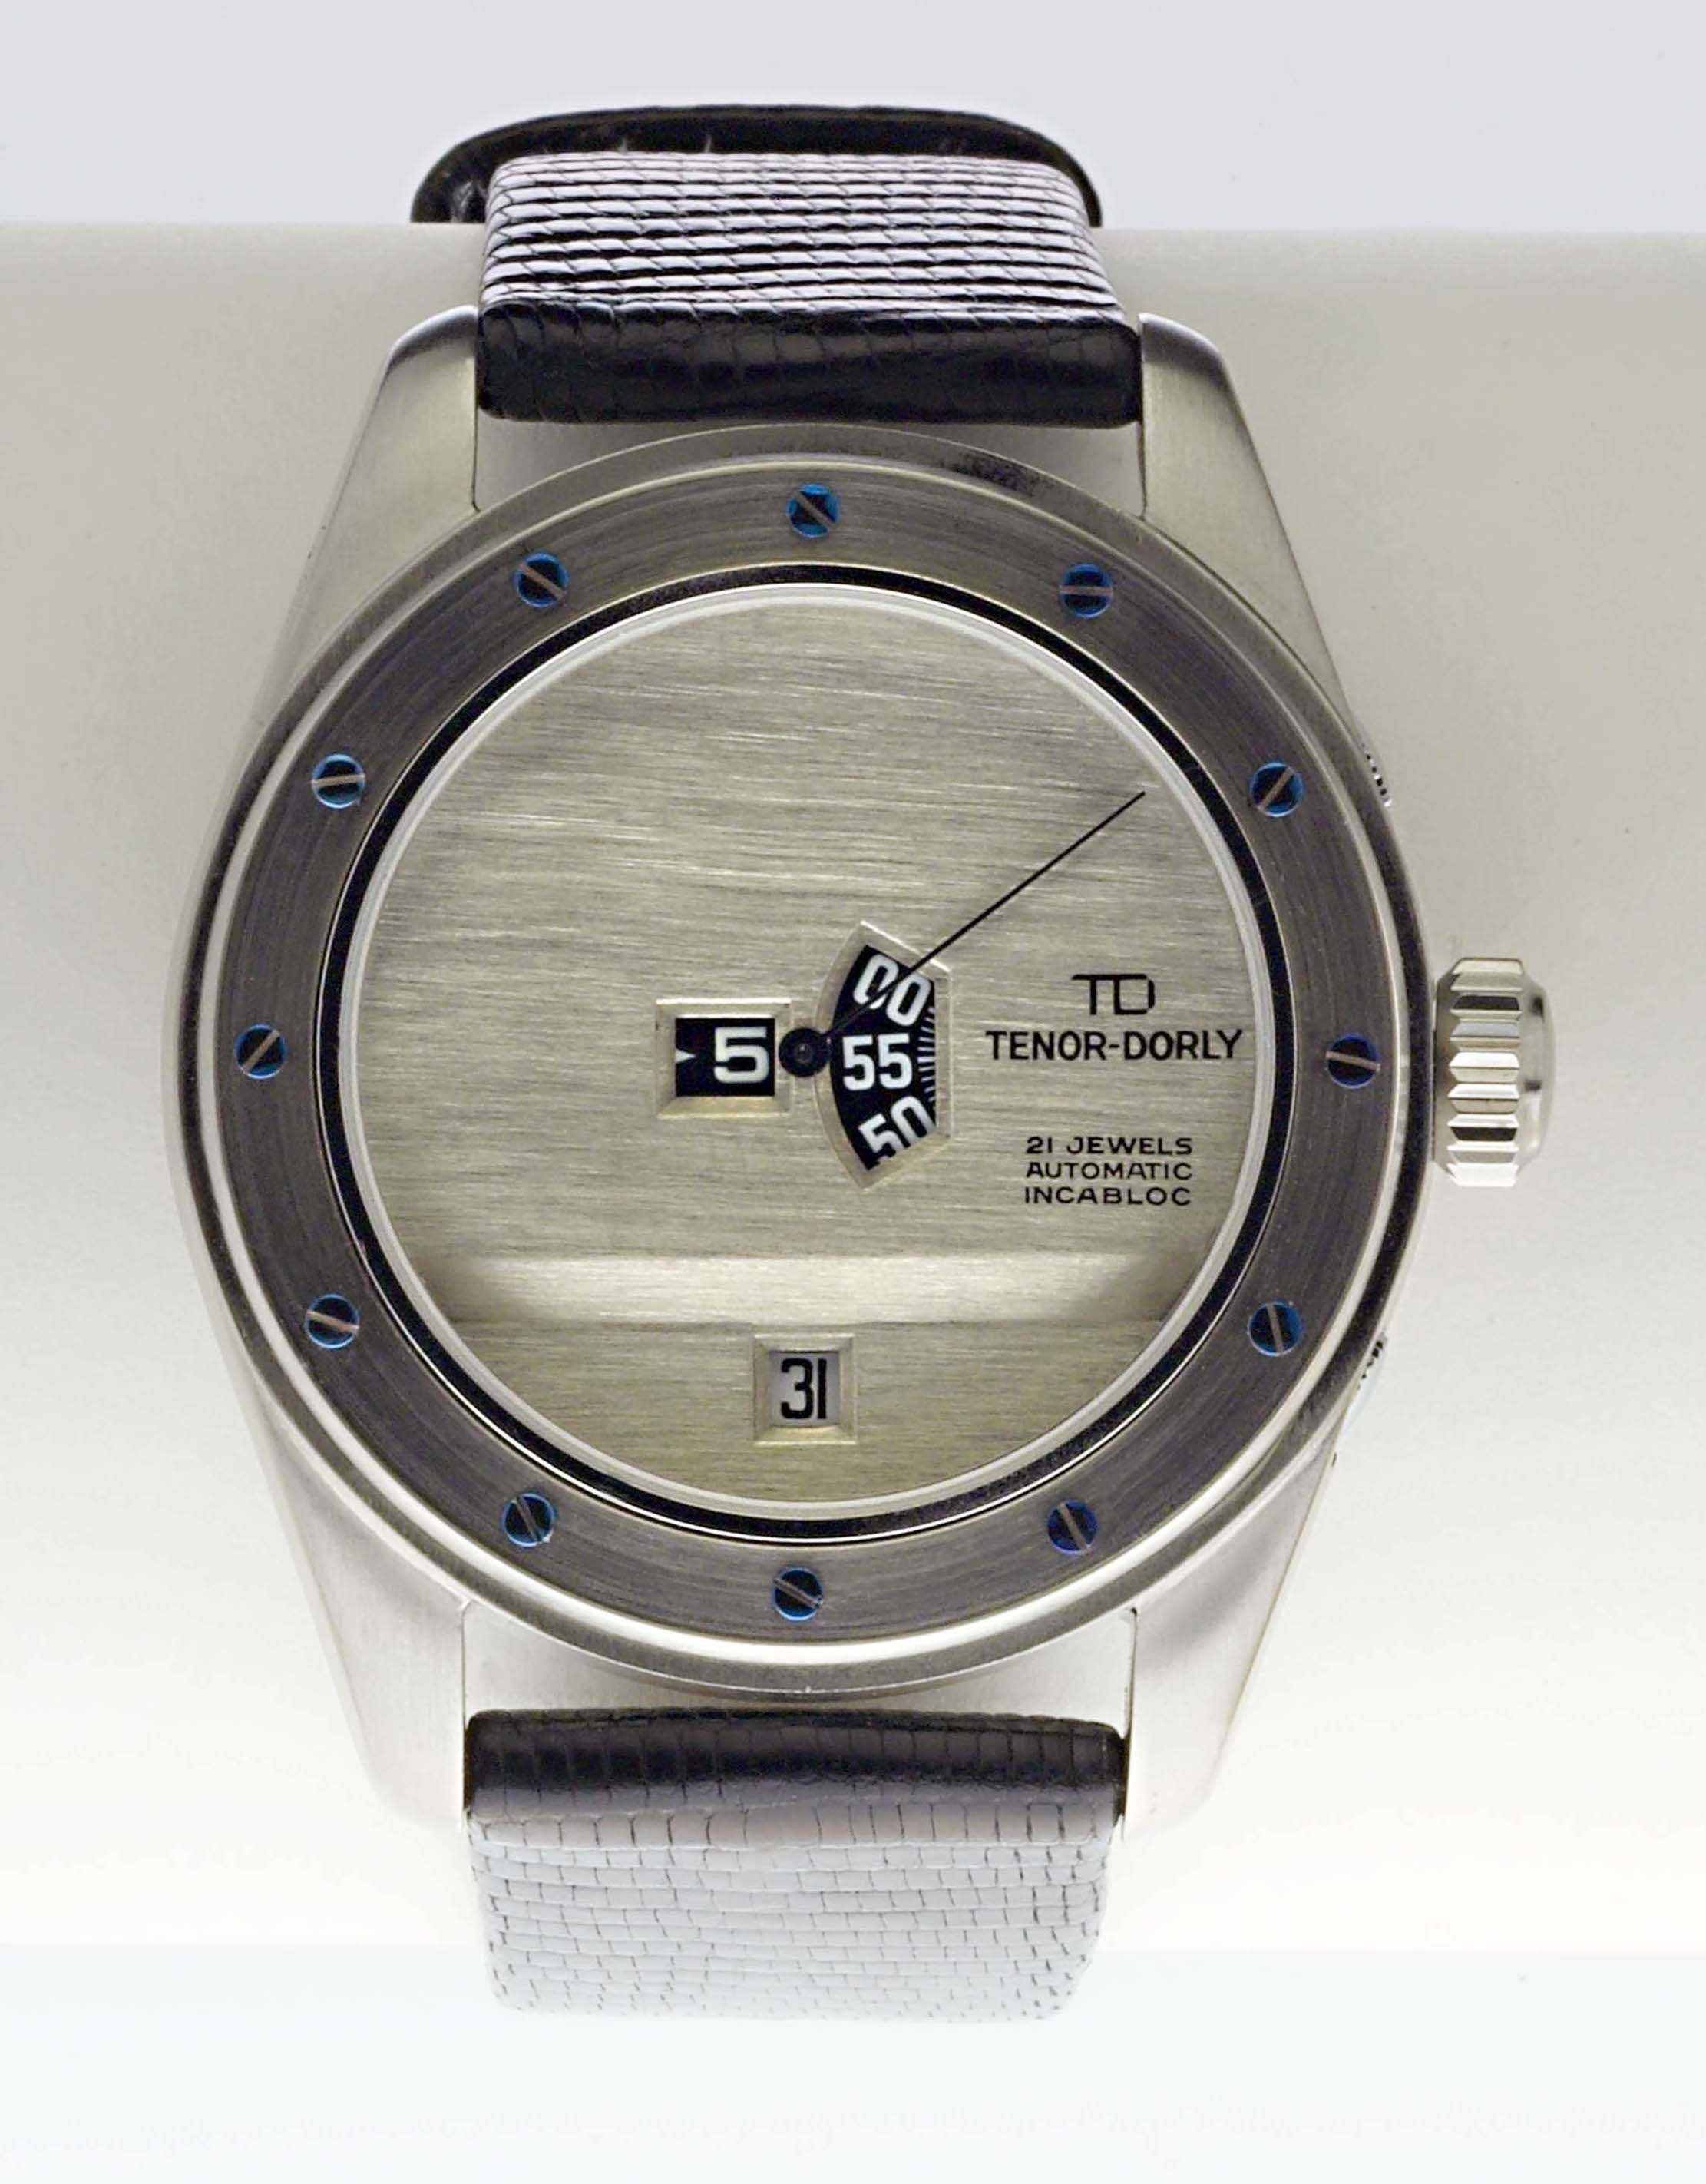 TENOR DORLY (Edition limitée Heure Sautante - Prototype / 30 Exemplaires), vers 2000